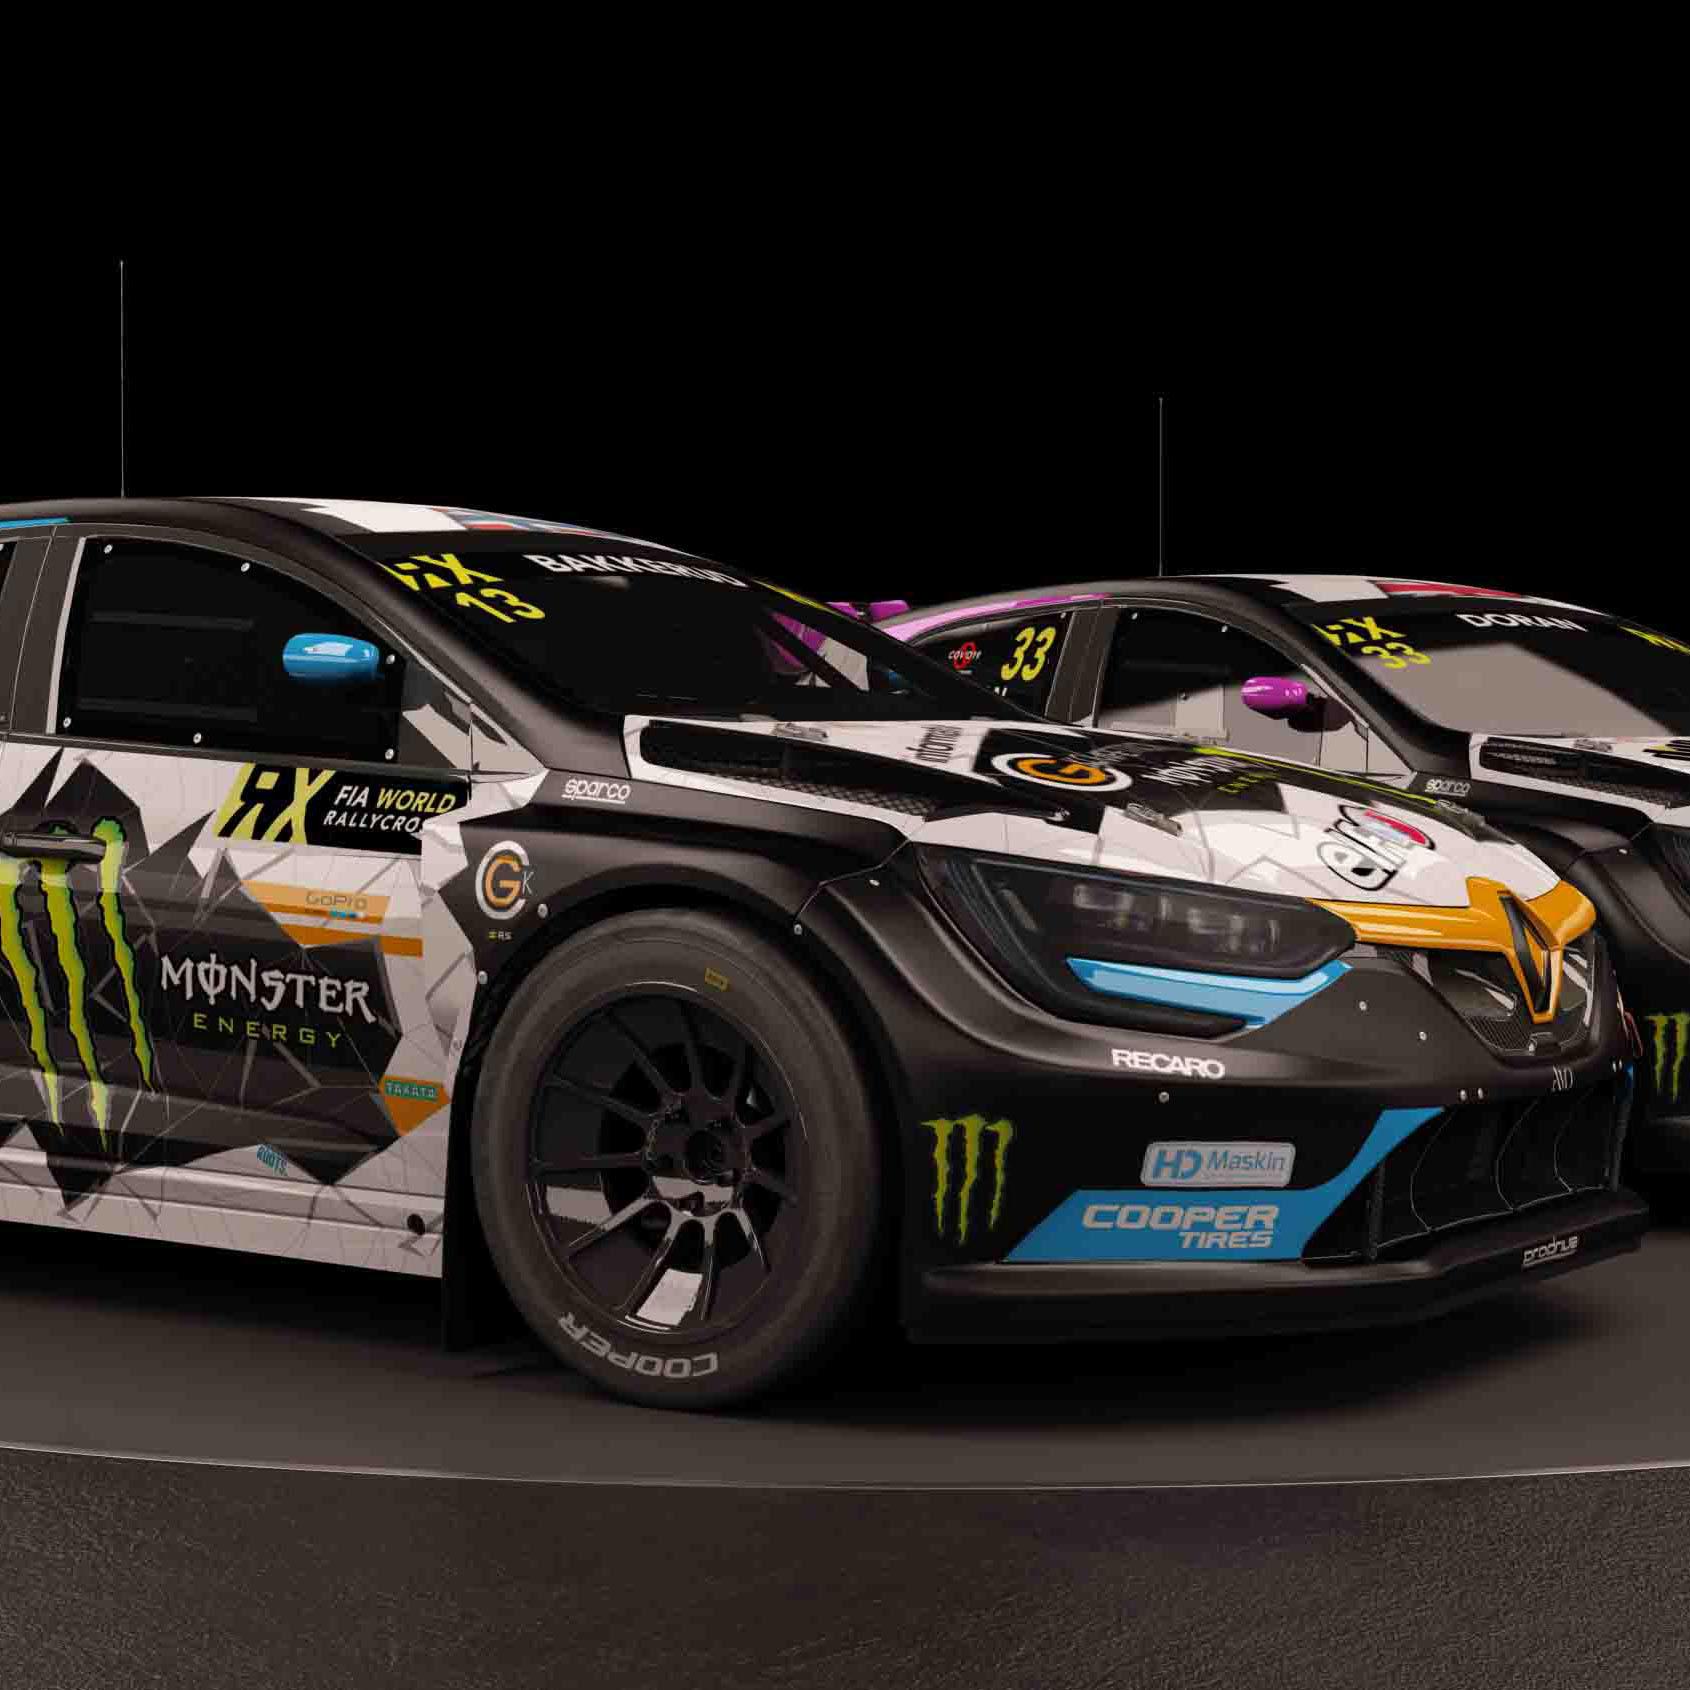 Renault Megane FIA World Rallycross AMD 05 a